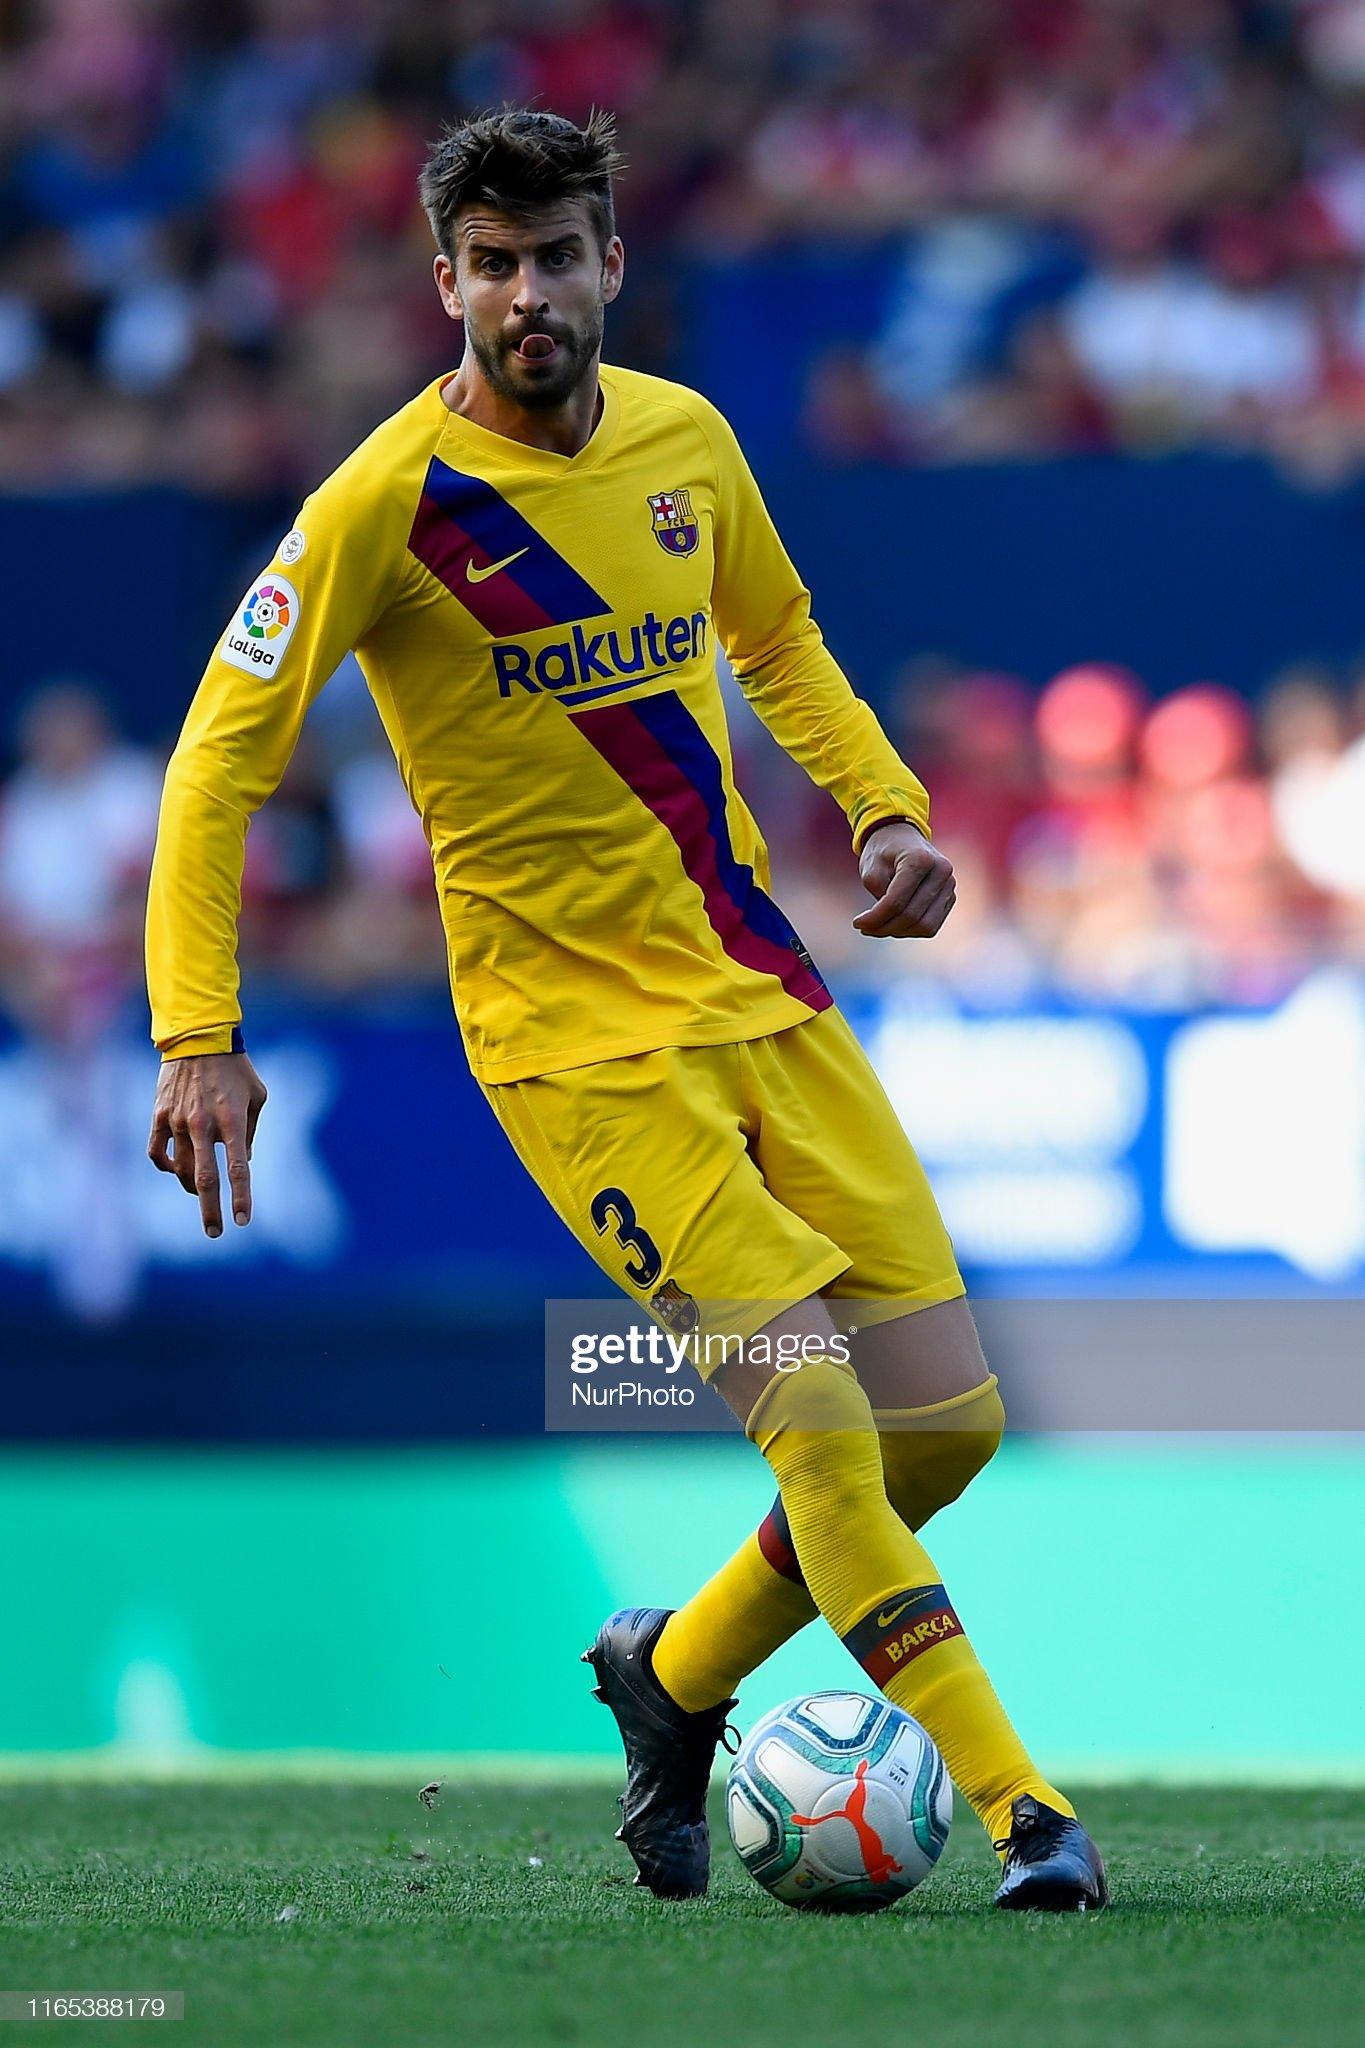 صور مباراة : أوساسونا - برشلونة 2-2 ( 31-08-2019 )  Gerard-pique-of-barcelona-controls-the-ball-during-the-liga-match-ca-picture-id1165388179?s=2048x2048